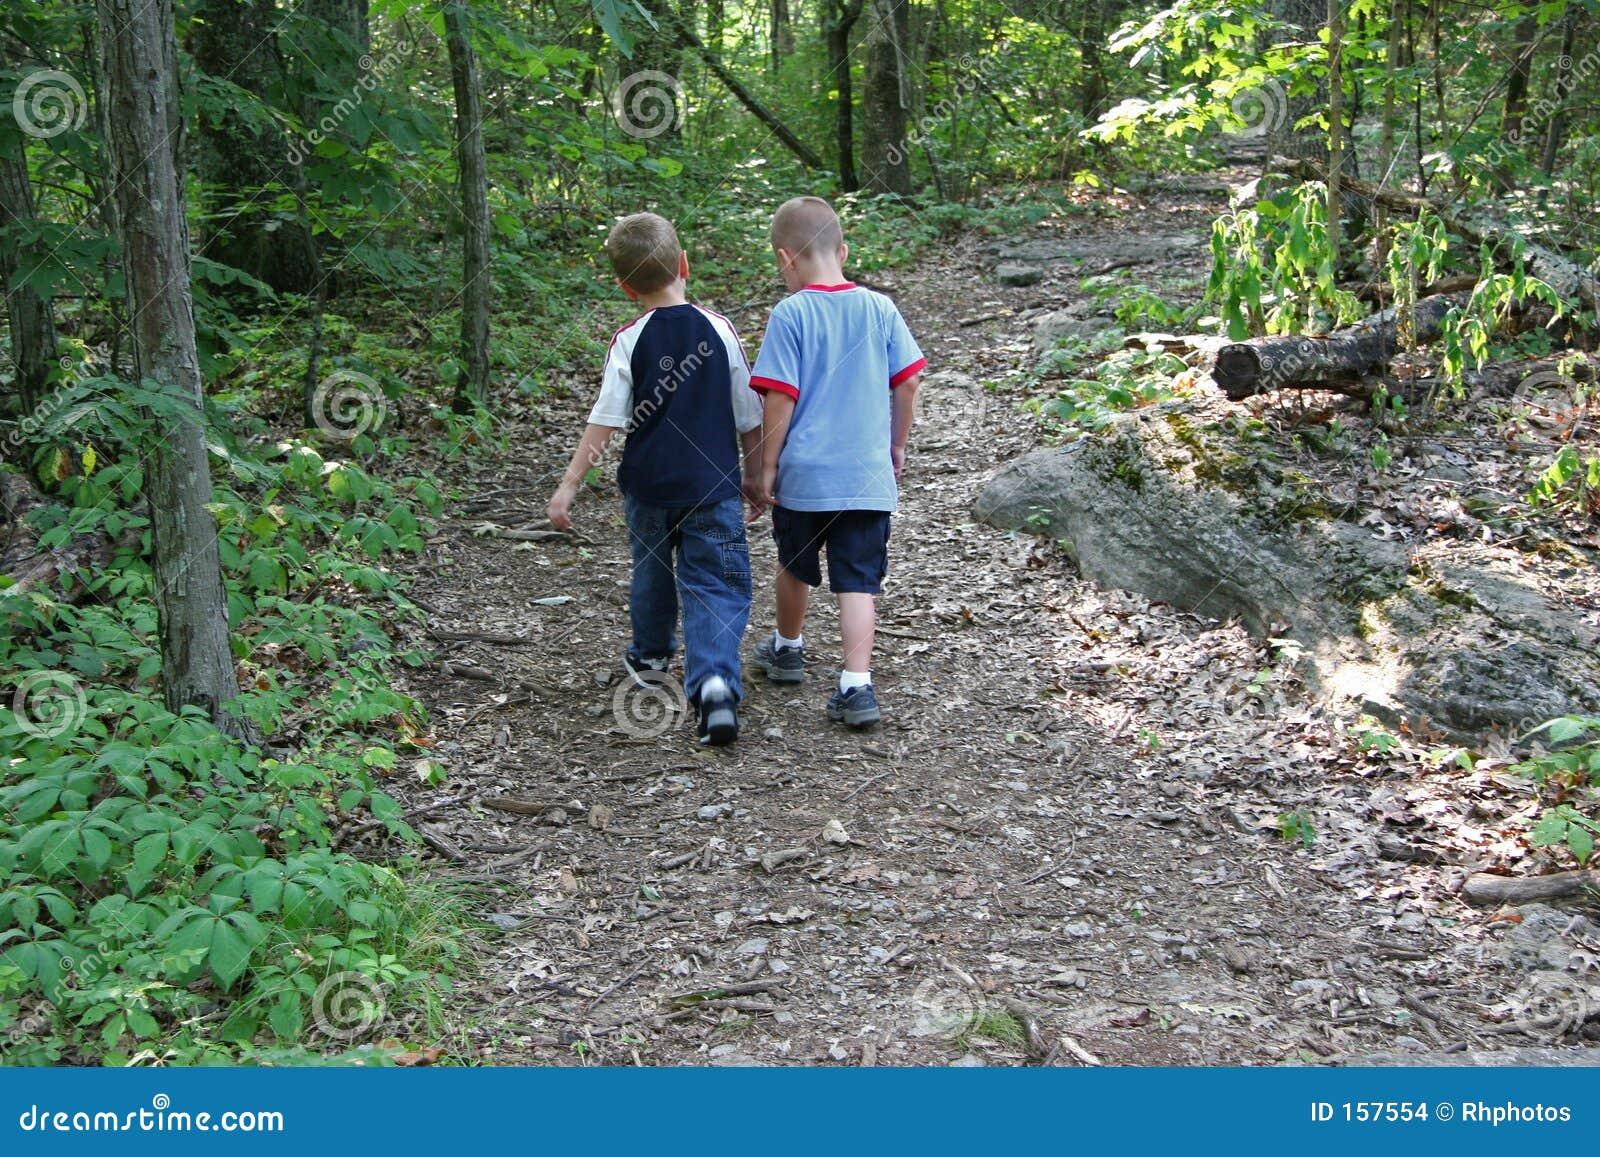 Boys Being Friends